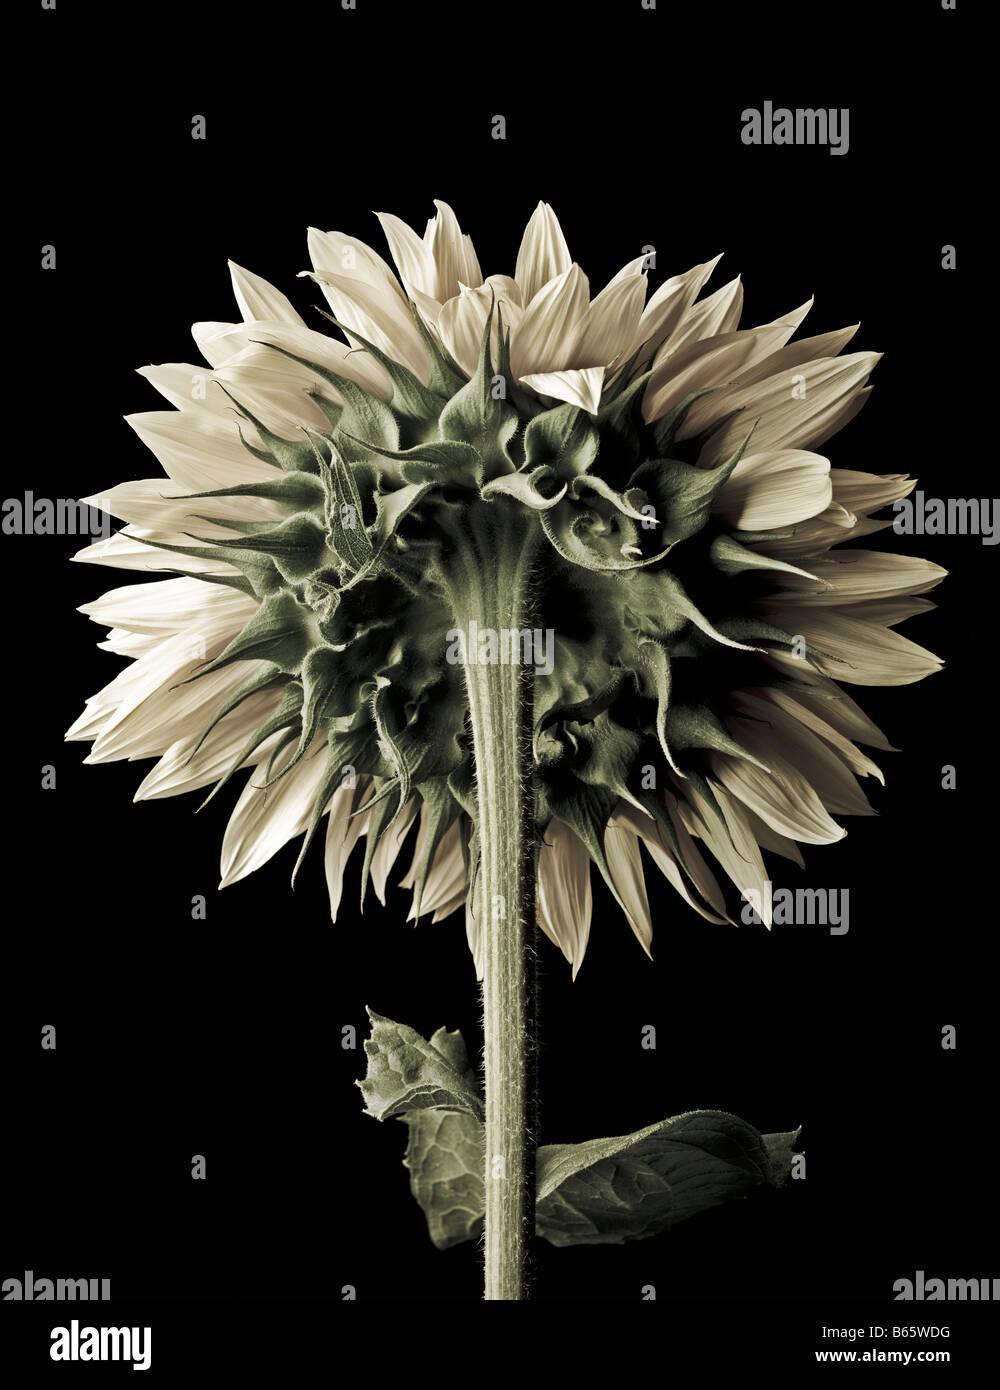 still life of sunflower Helianthus annus family Compositae - Stock Image